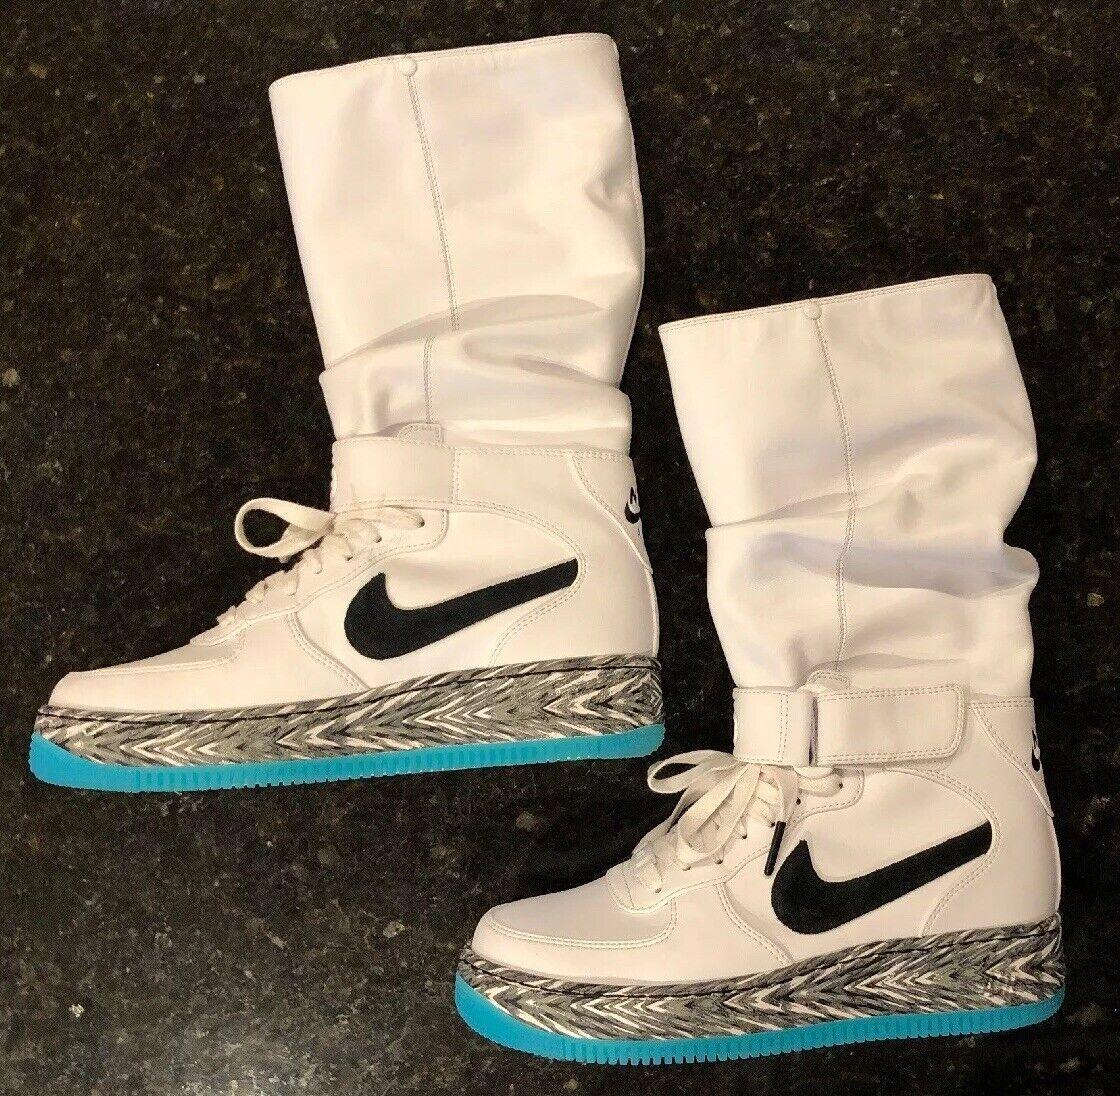 New  Looksee Nike Air Force 1 Upstep Warrior N7 Donne 65533;7 Nuovi Scarpe Bianche  migliore vendita